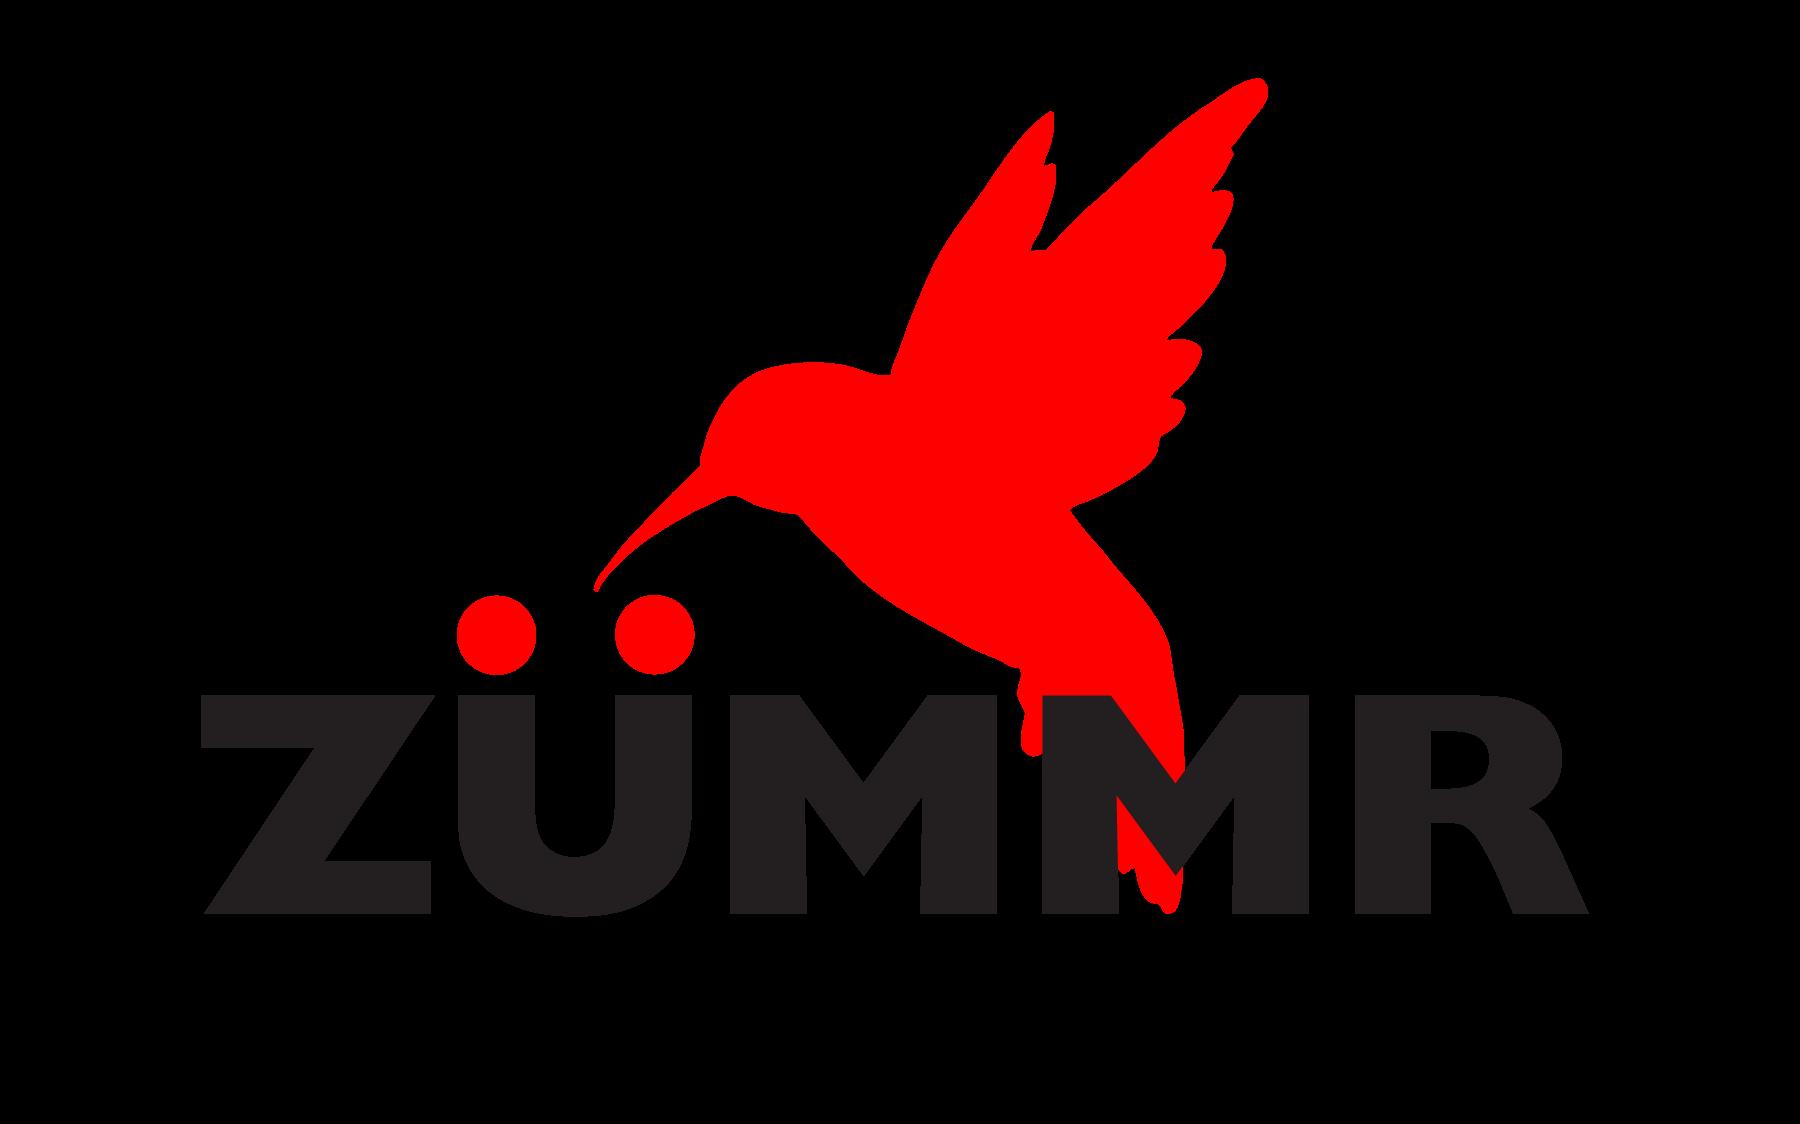 ZUMMR